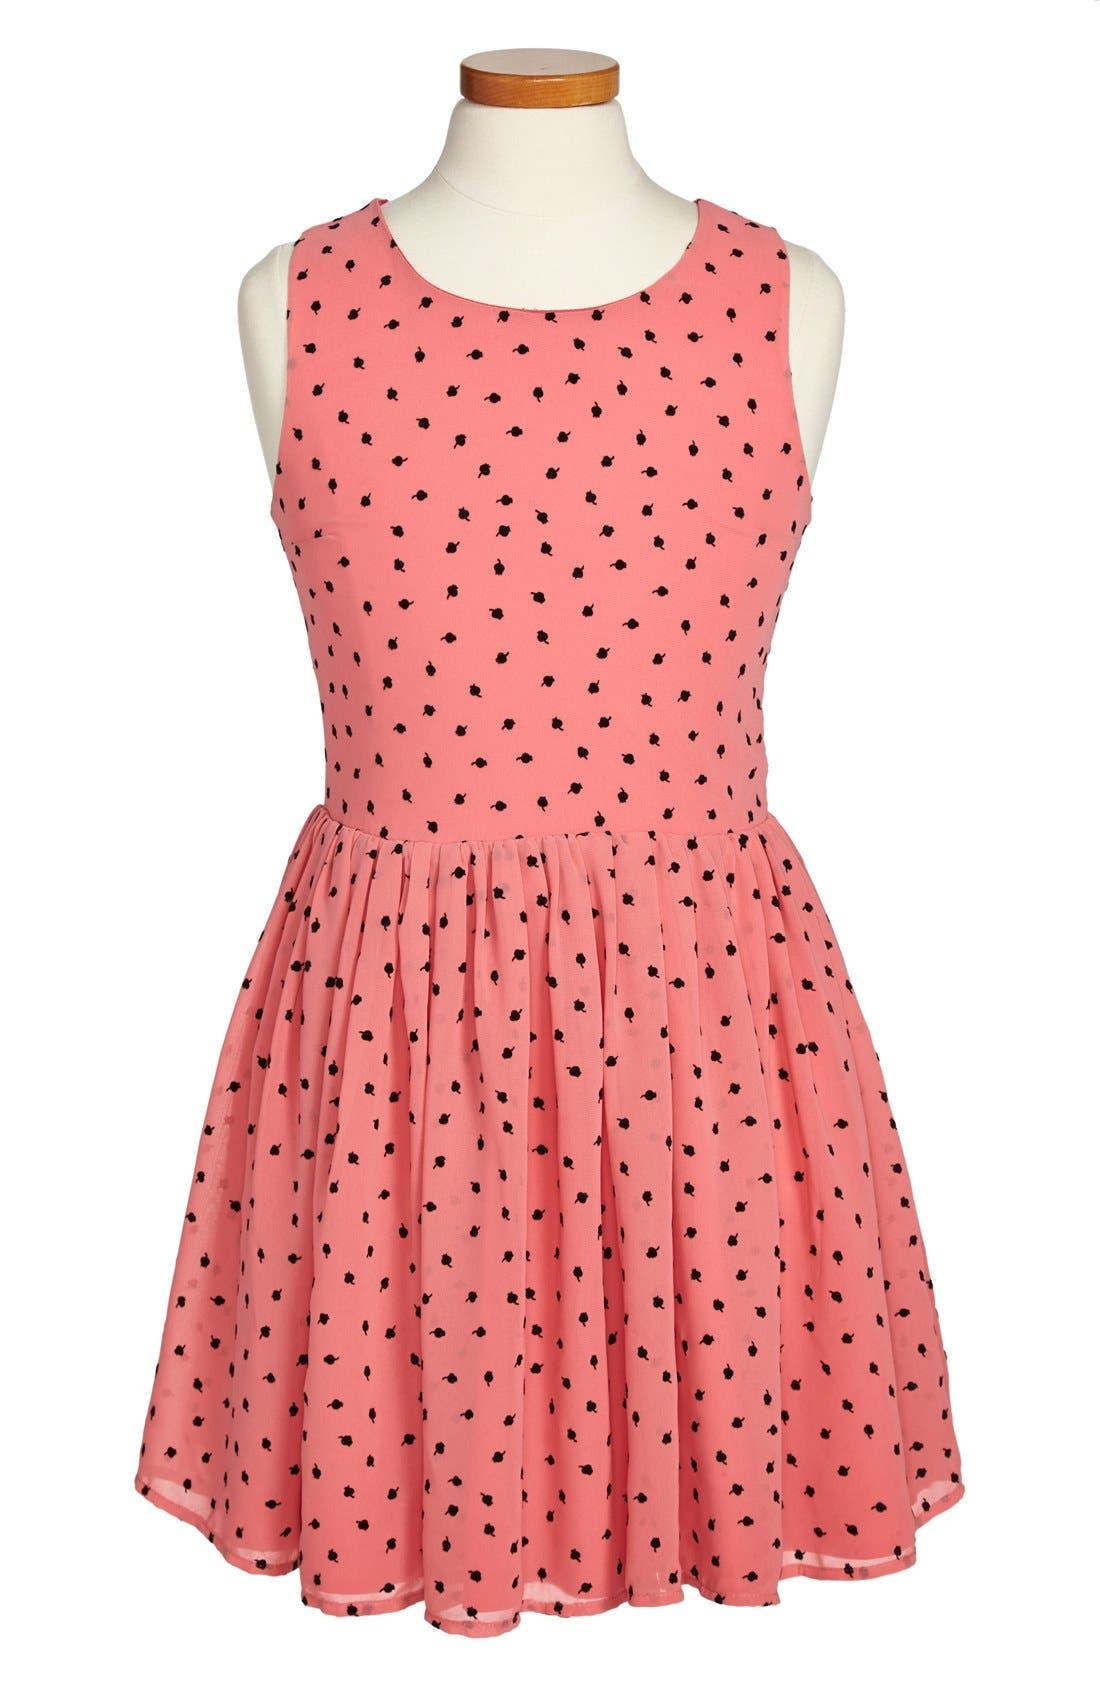 Main Image - Miss Behave 'Tulip' Chiffon Dress (Big Girls)